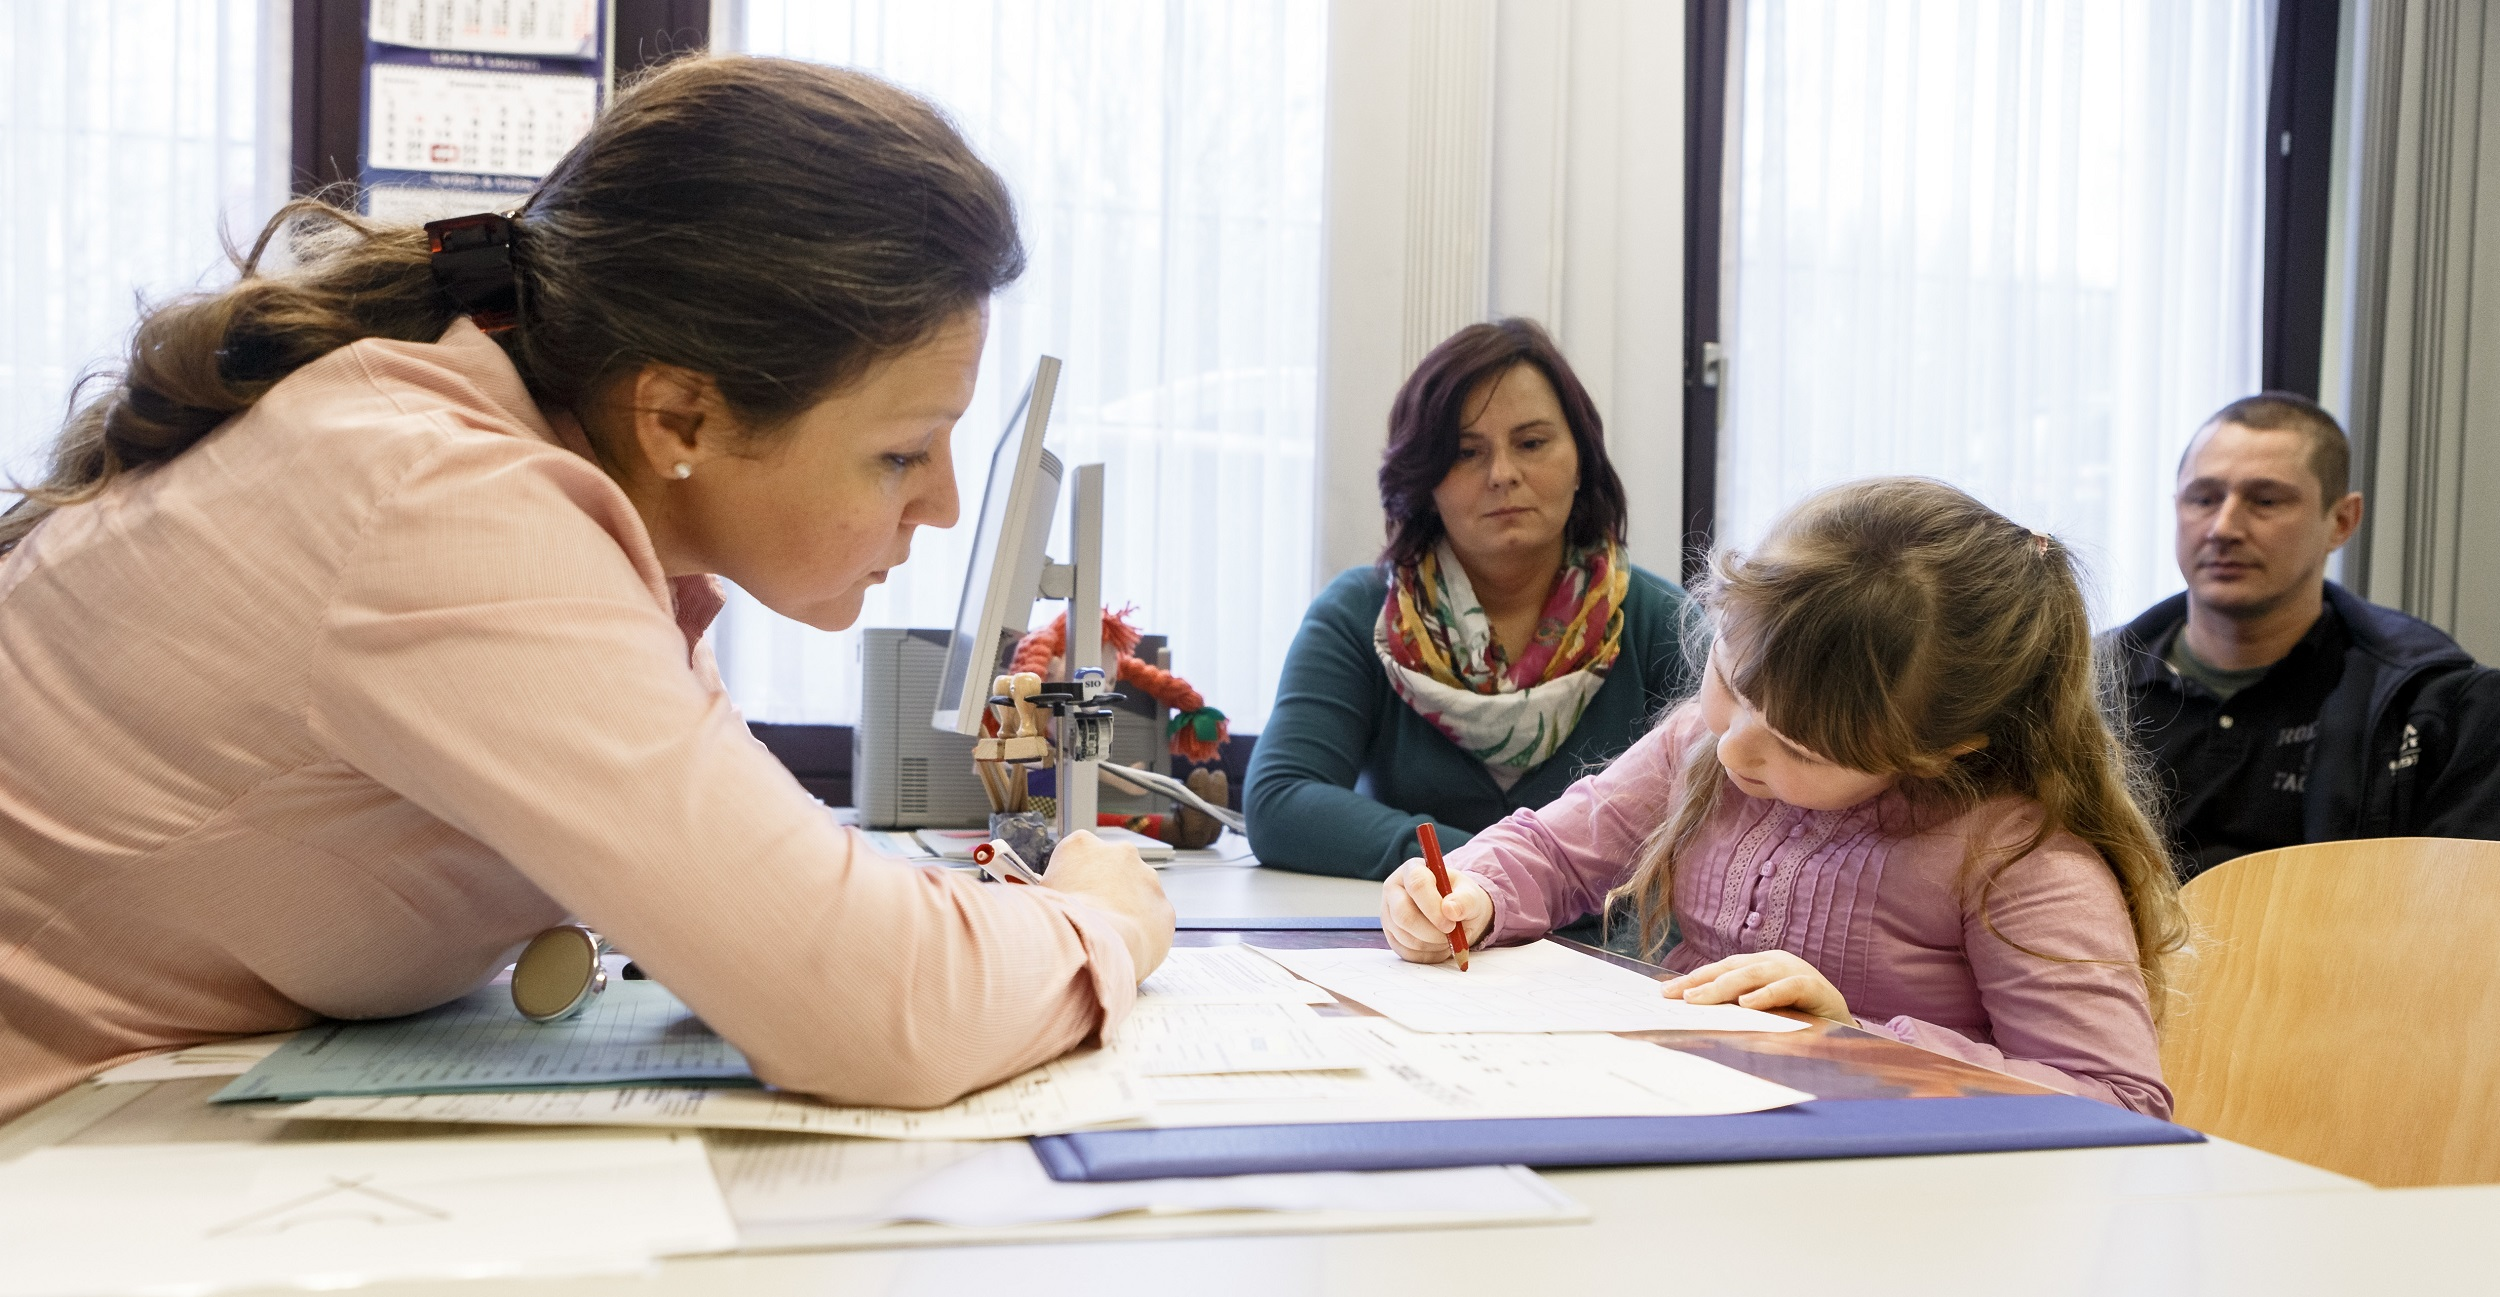 Entwicklung im Blick: Die Schuleingangsuntersuchung. Foto: dpa / Scholz